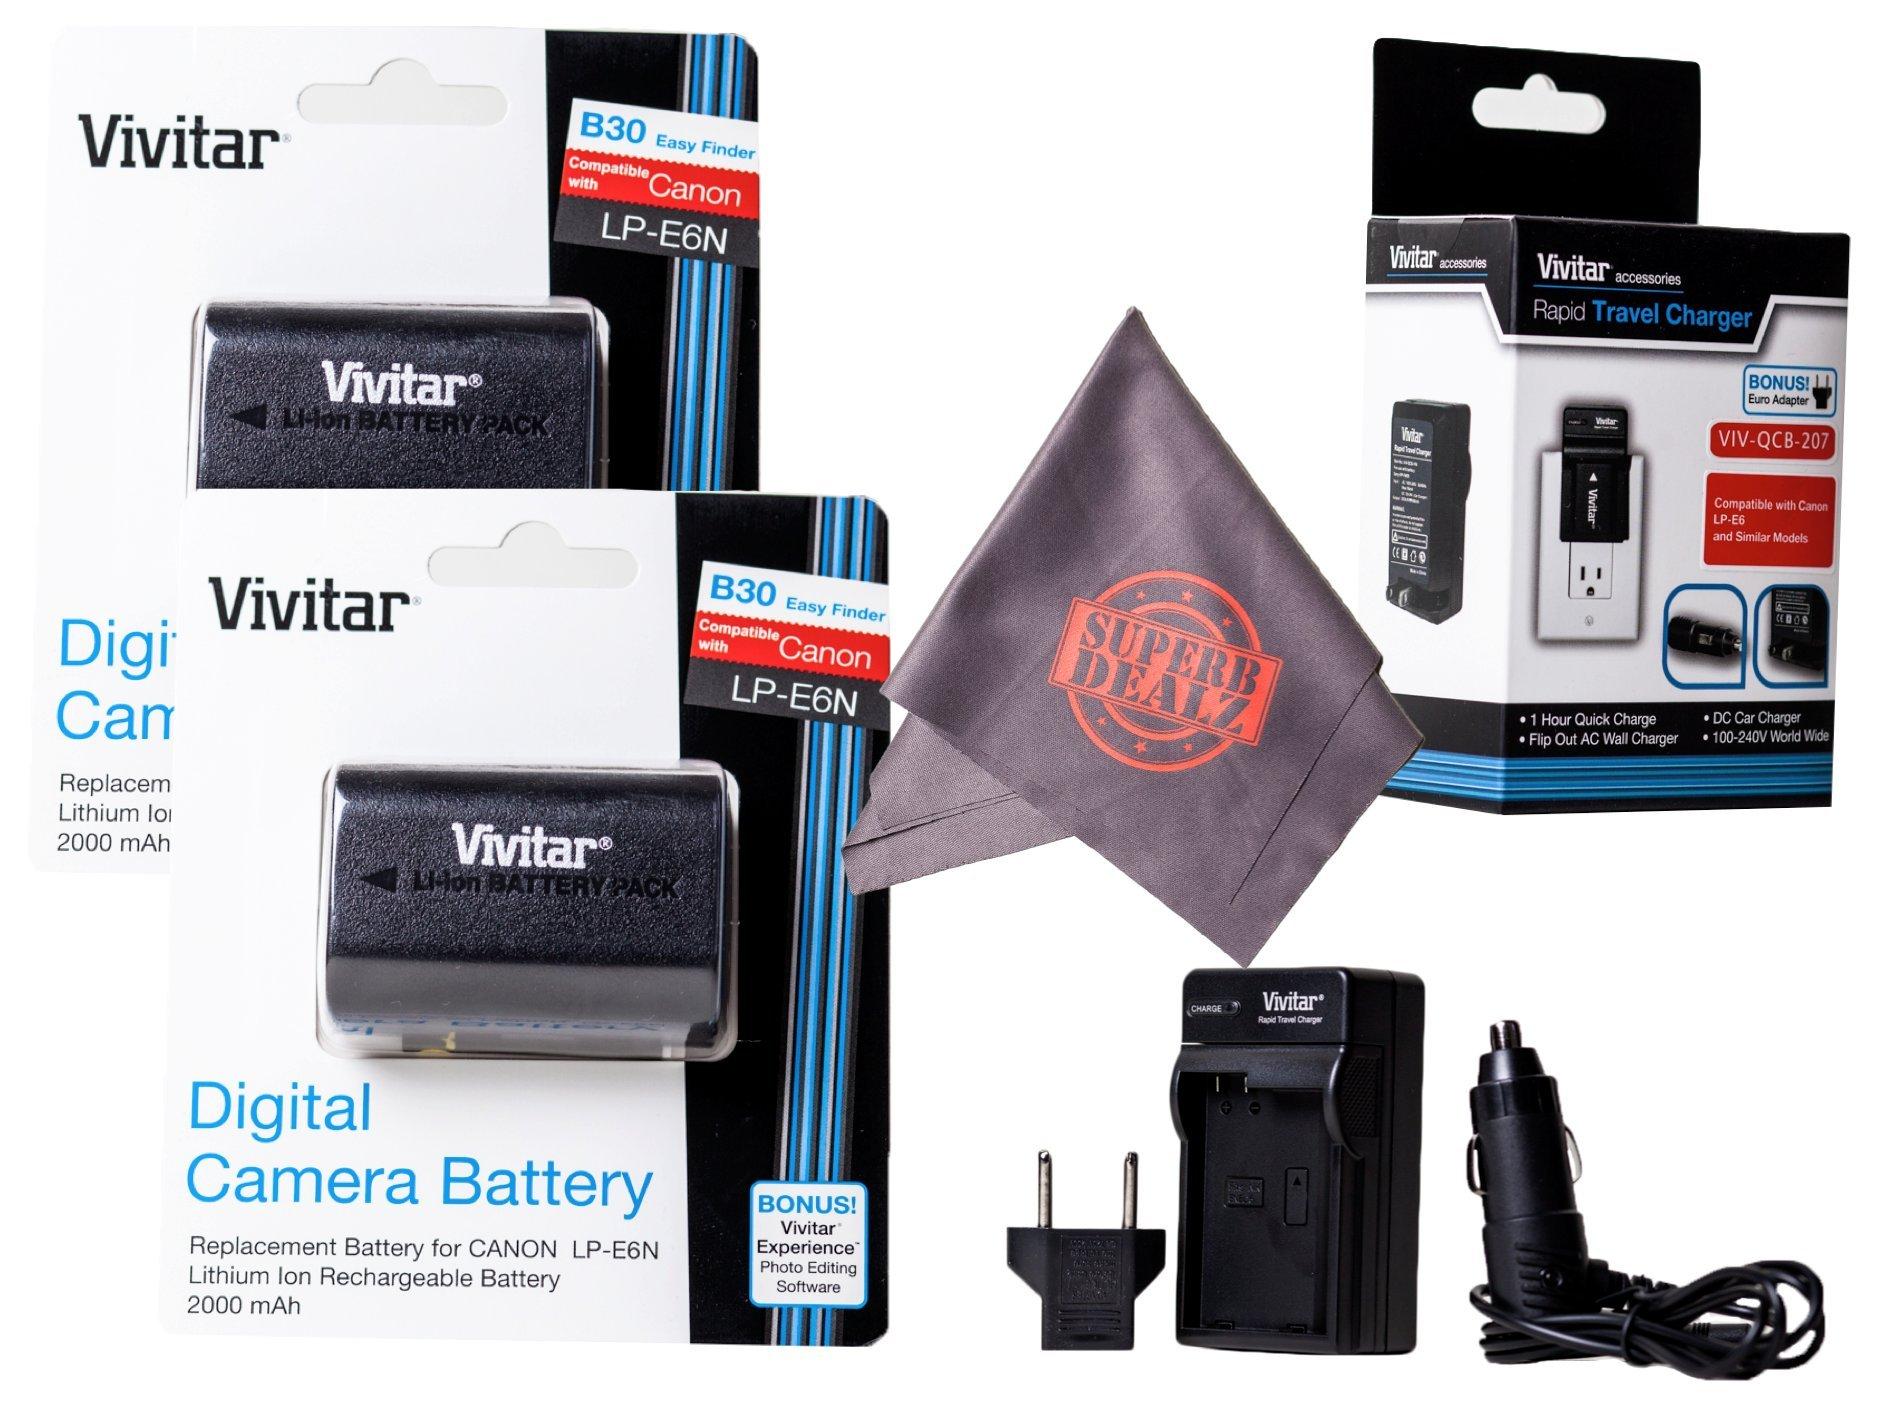 2 Pack of LP-E6 / LP-E6N Vivitar Ultra High Capacity Rechargeable 2000mAh Li-ion Batteries + AC/DC Vivitar Rapid Travel Charger + Microfiber Lens Cleaning Cloth LPE6 (Canon LP-E6 Replacement)